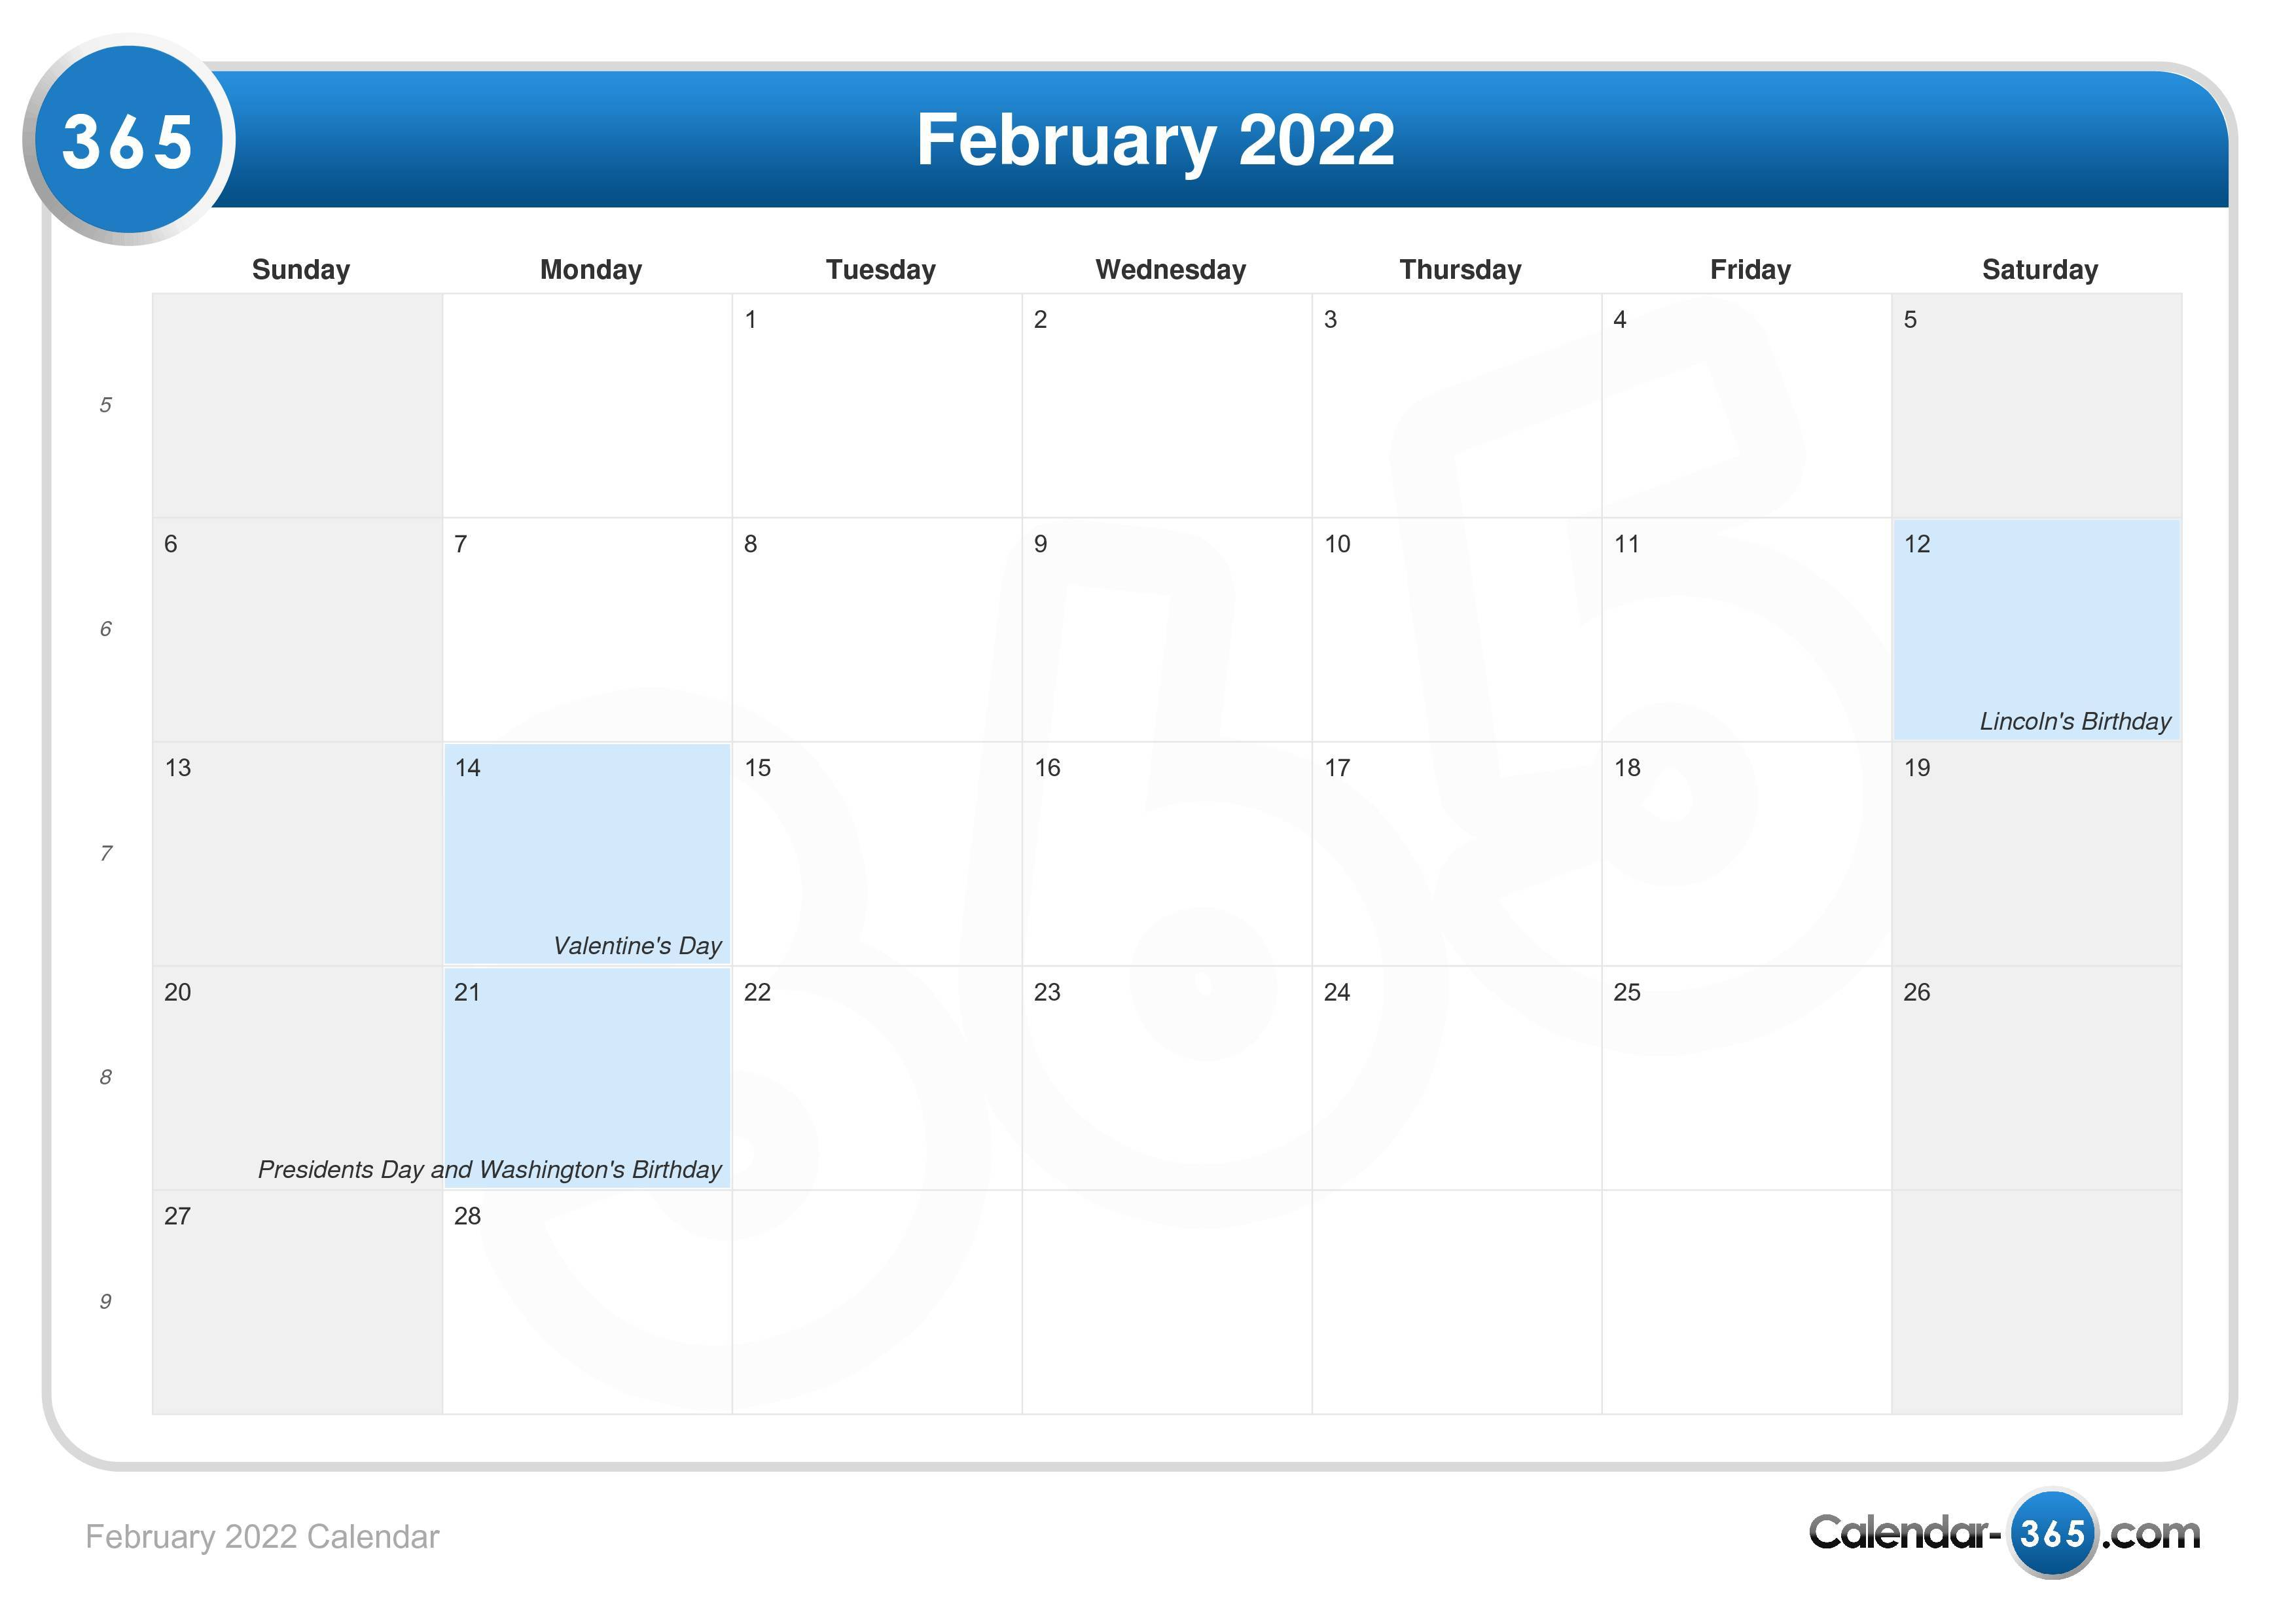 Moon Calendar February 2022.February 2022 Calendar